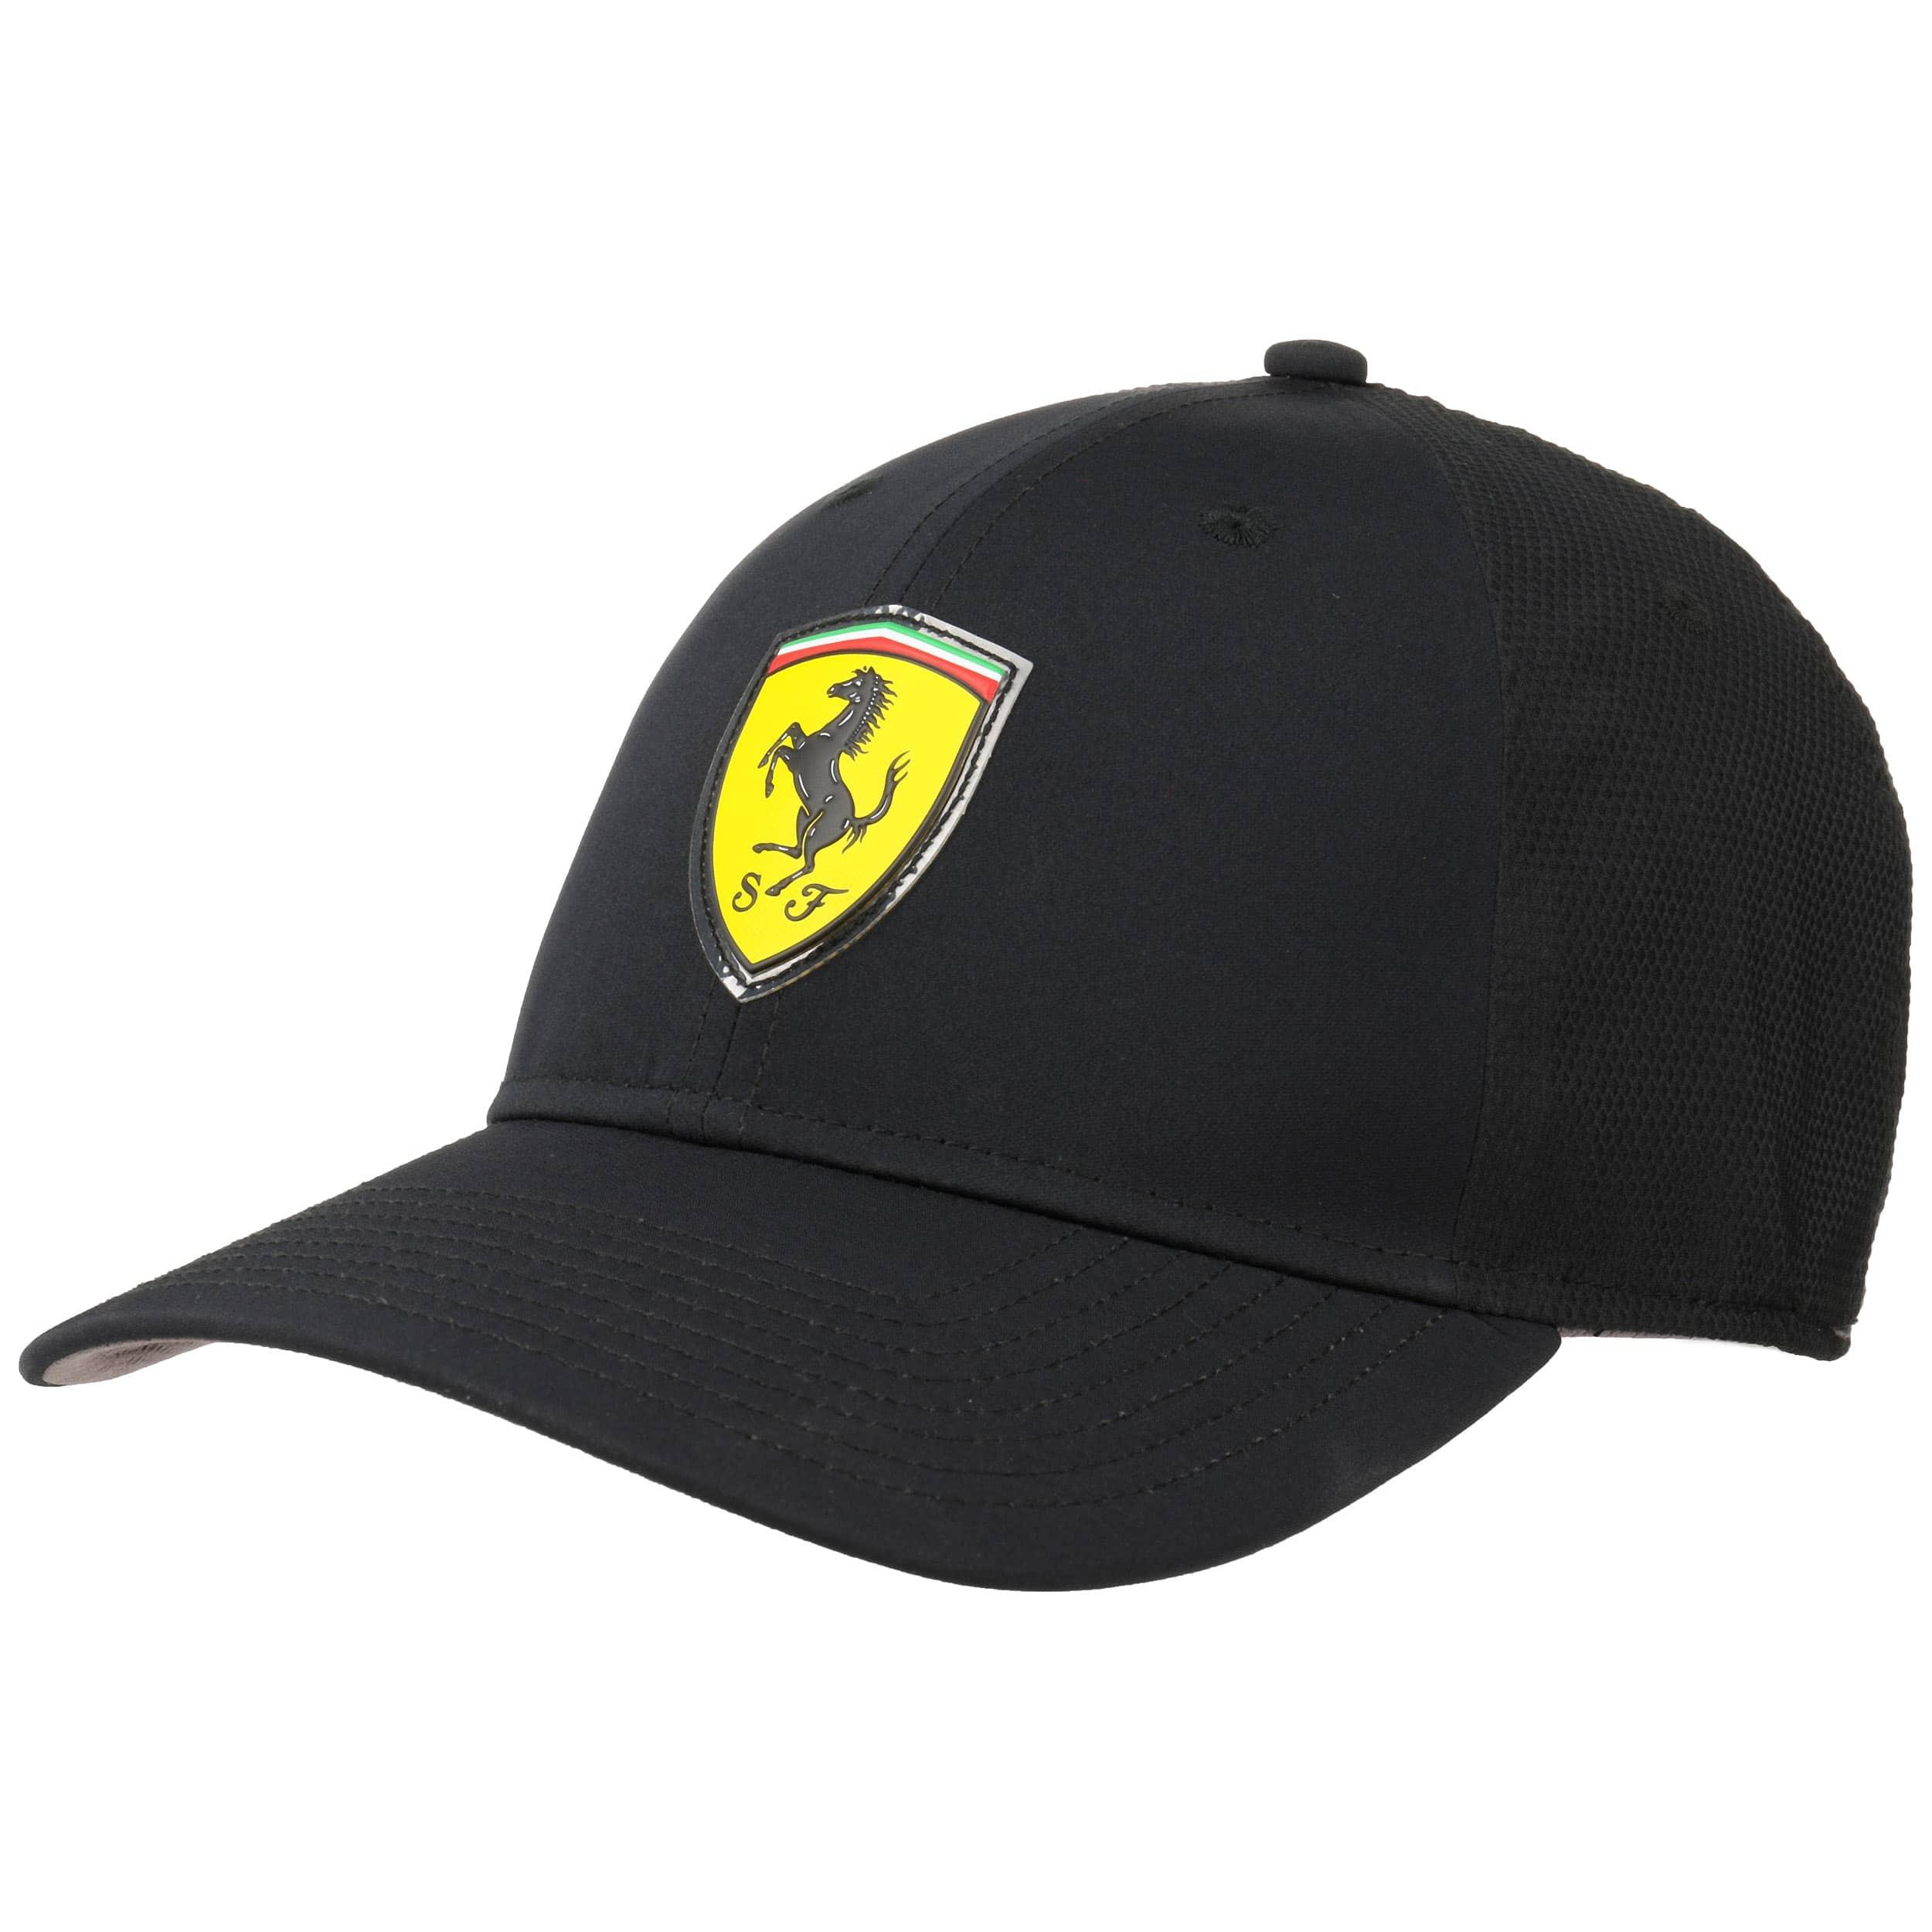 Puma Beanie Hats And Caps